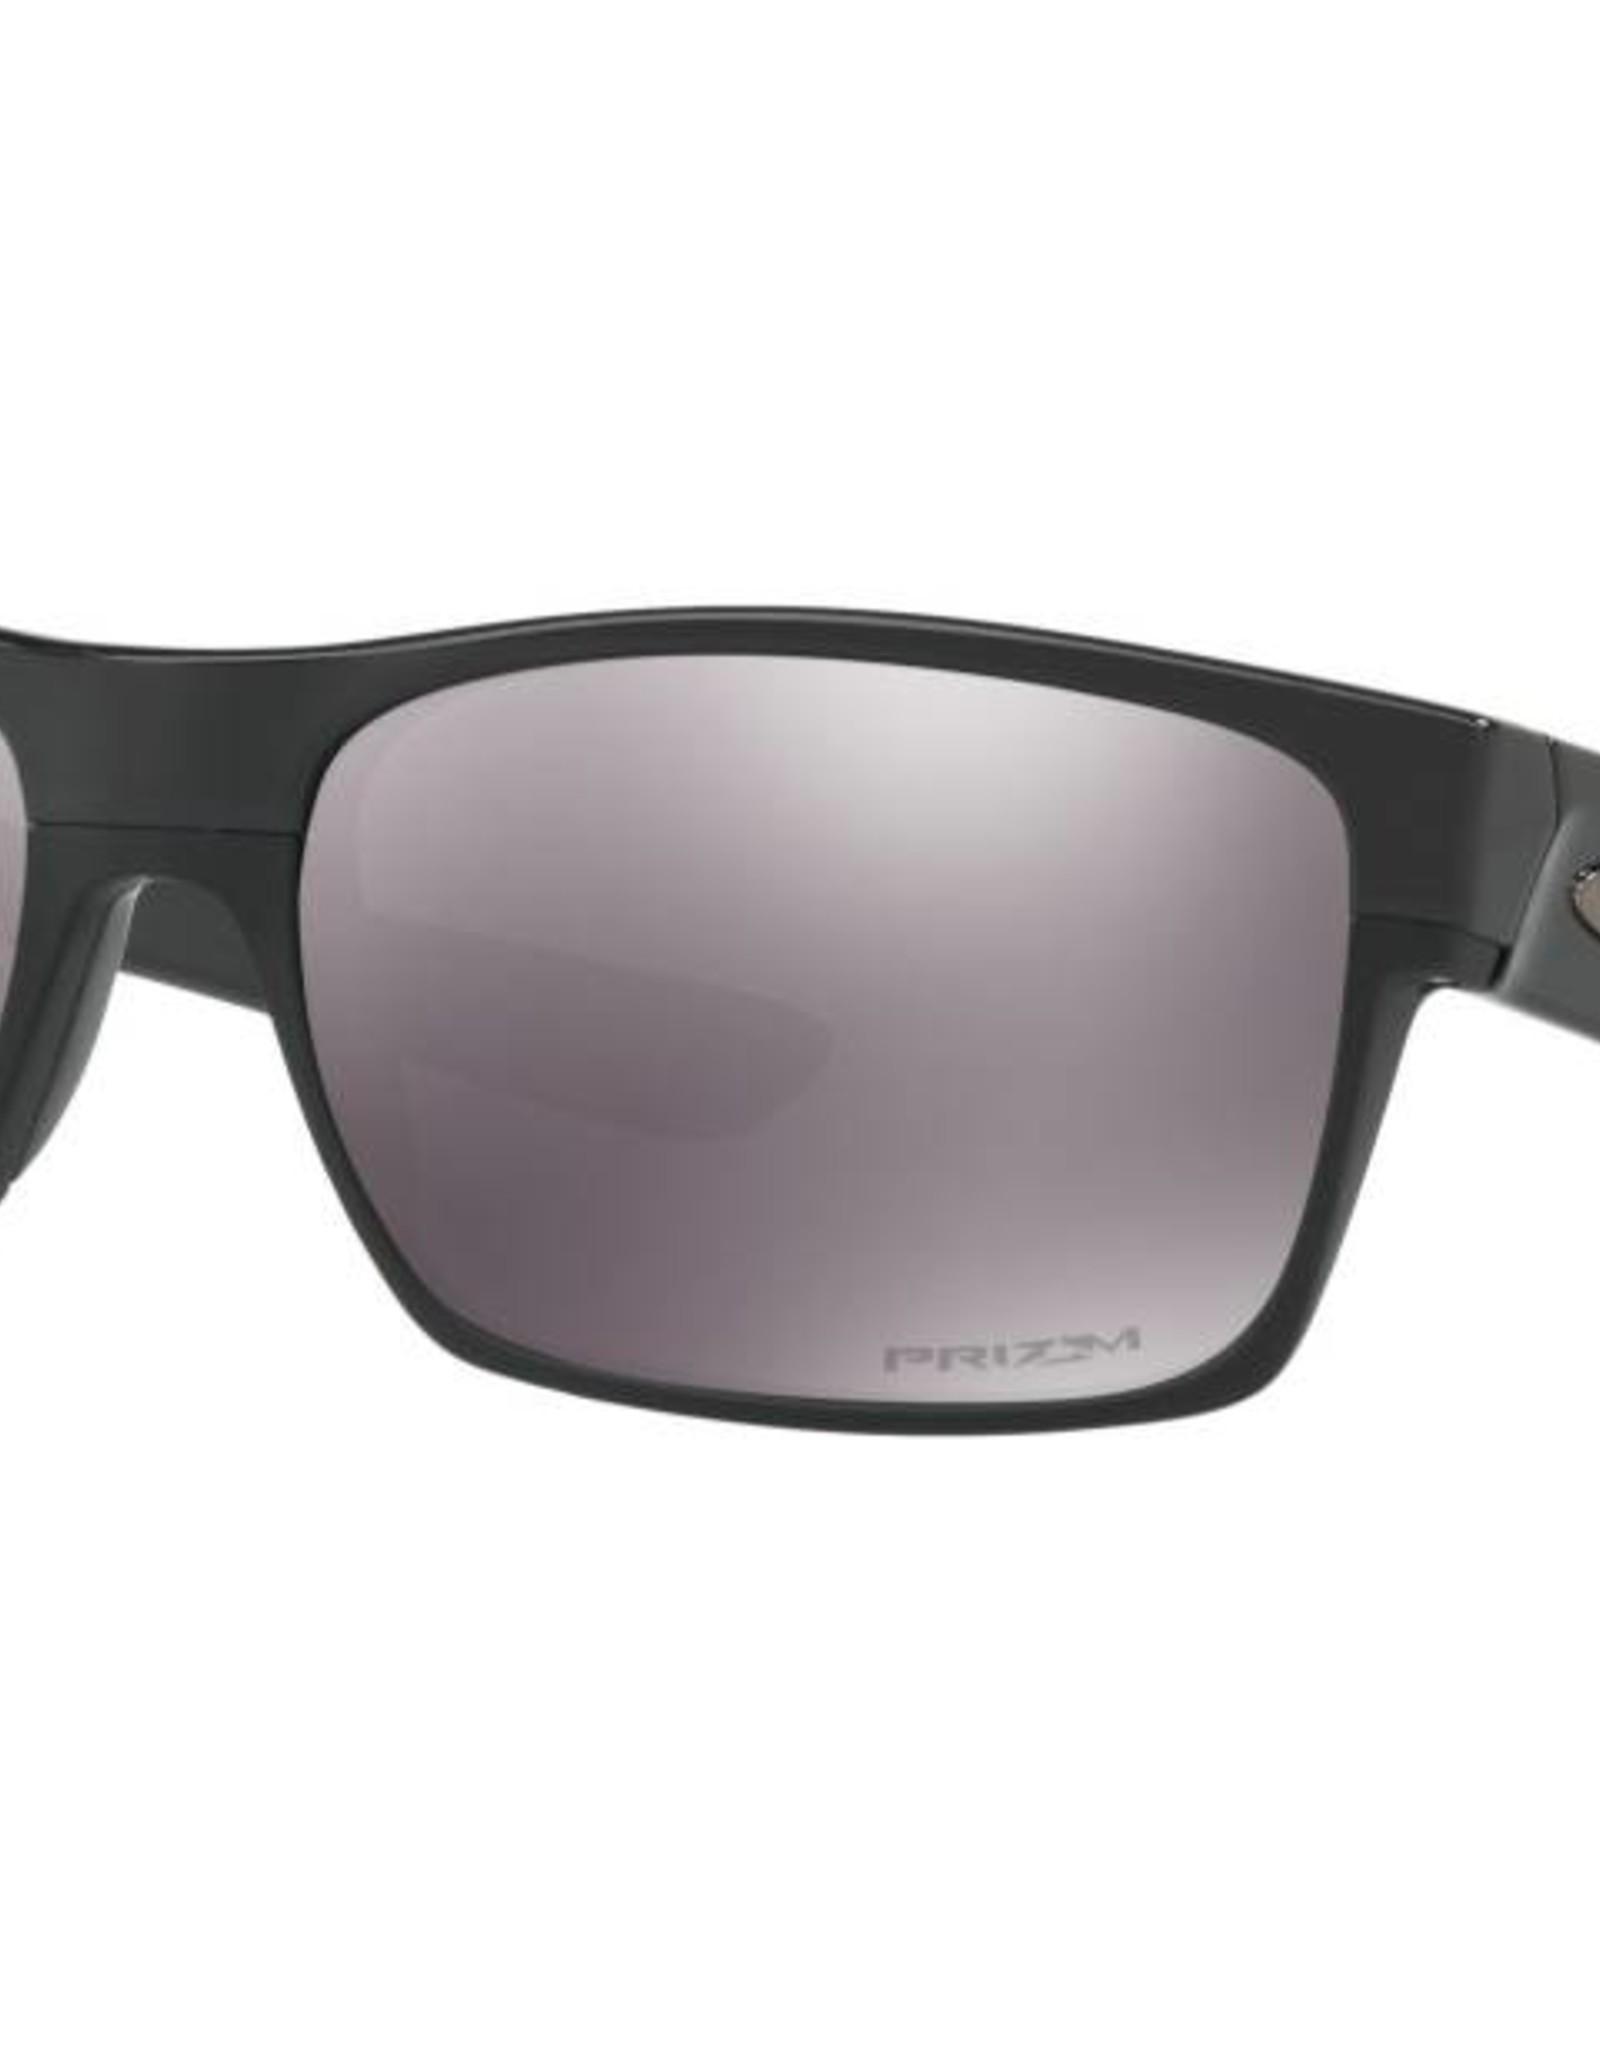 Oakley Oakley - TWOFACE - Matte Black w/ PRIZM POLAR Black